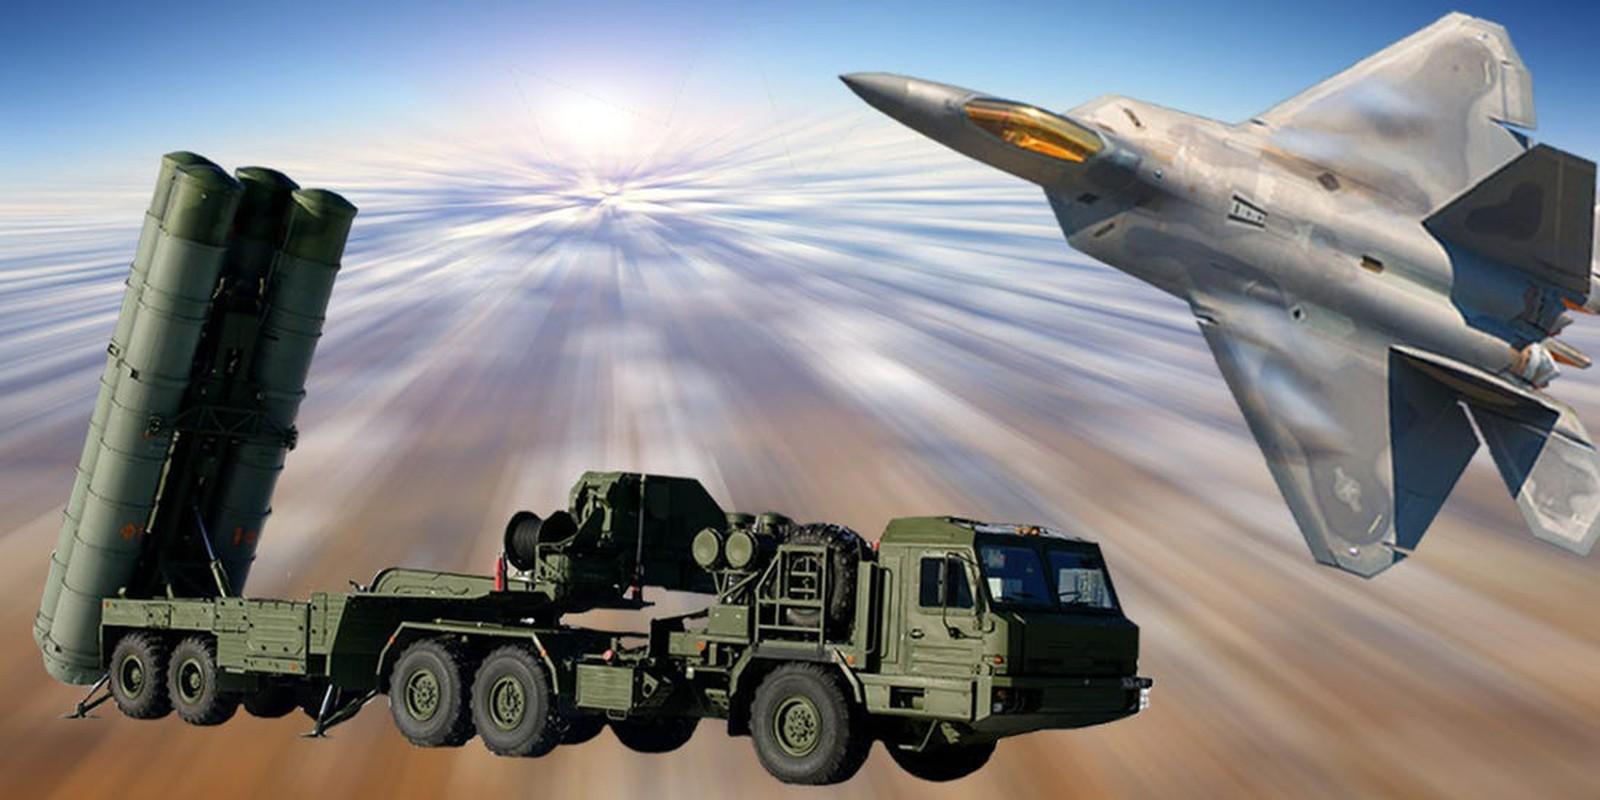 Tam quet toi da 600 km nhung S-400 chi phat hien duoc F-35 o... 36 km-Hinh-5